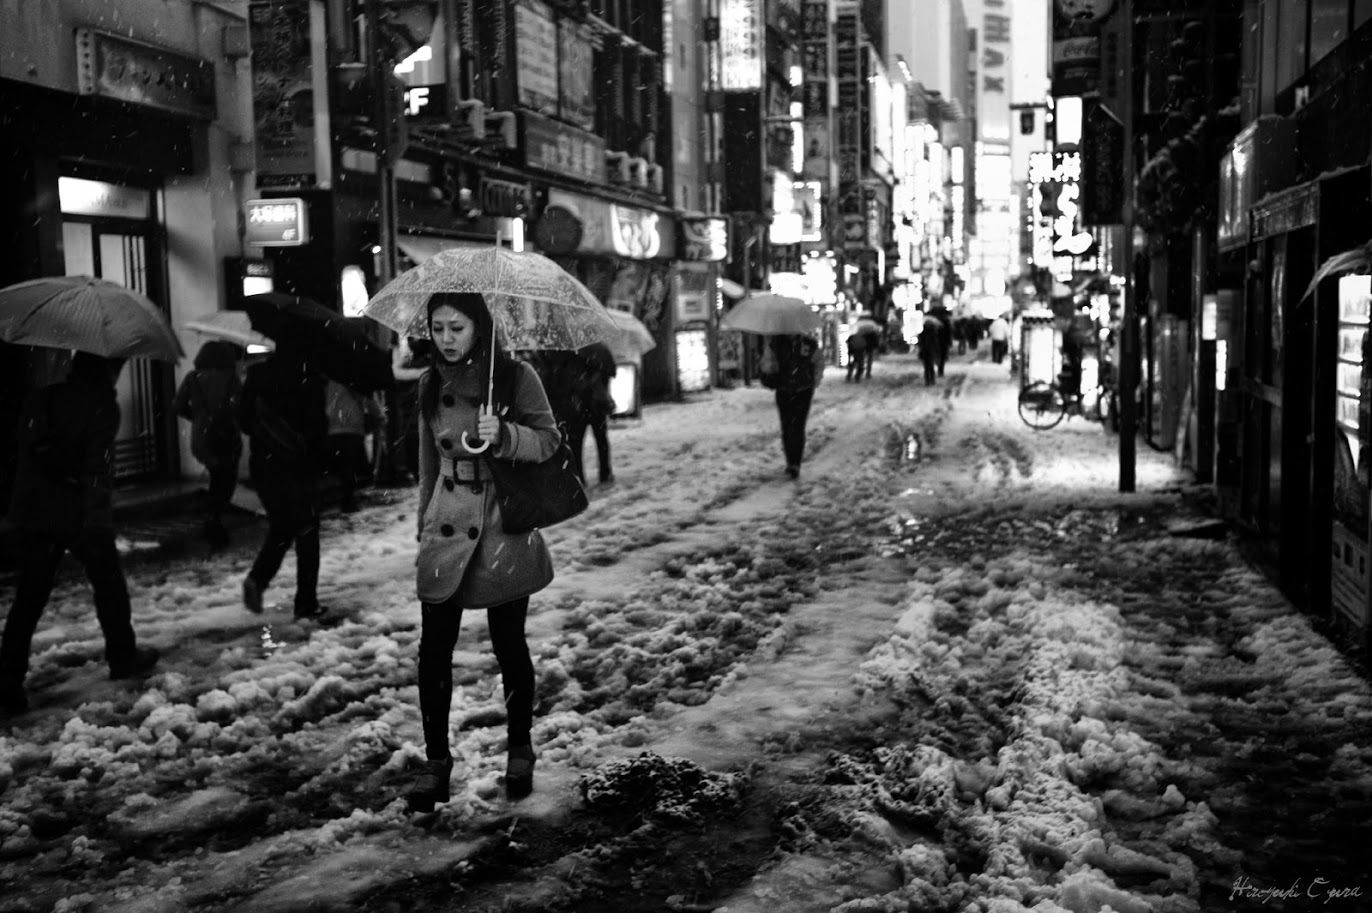 Hiroyuki Ogura photography 9